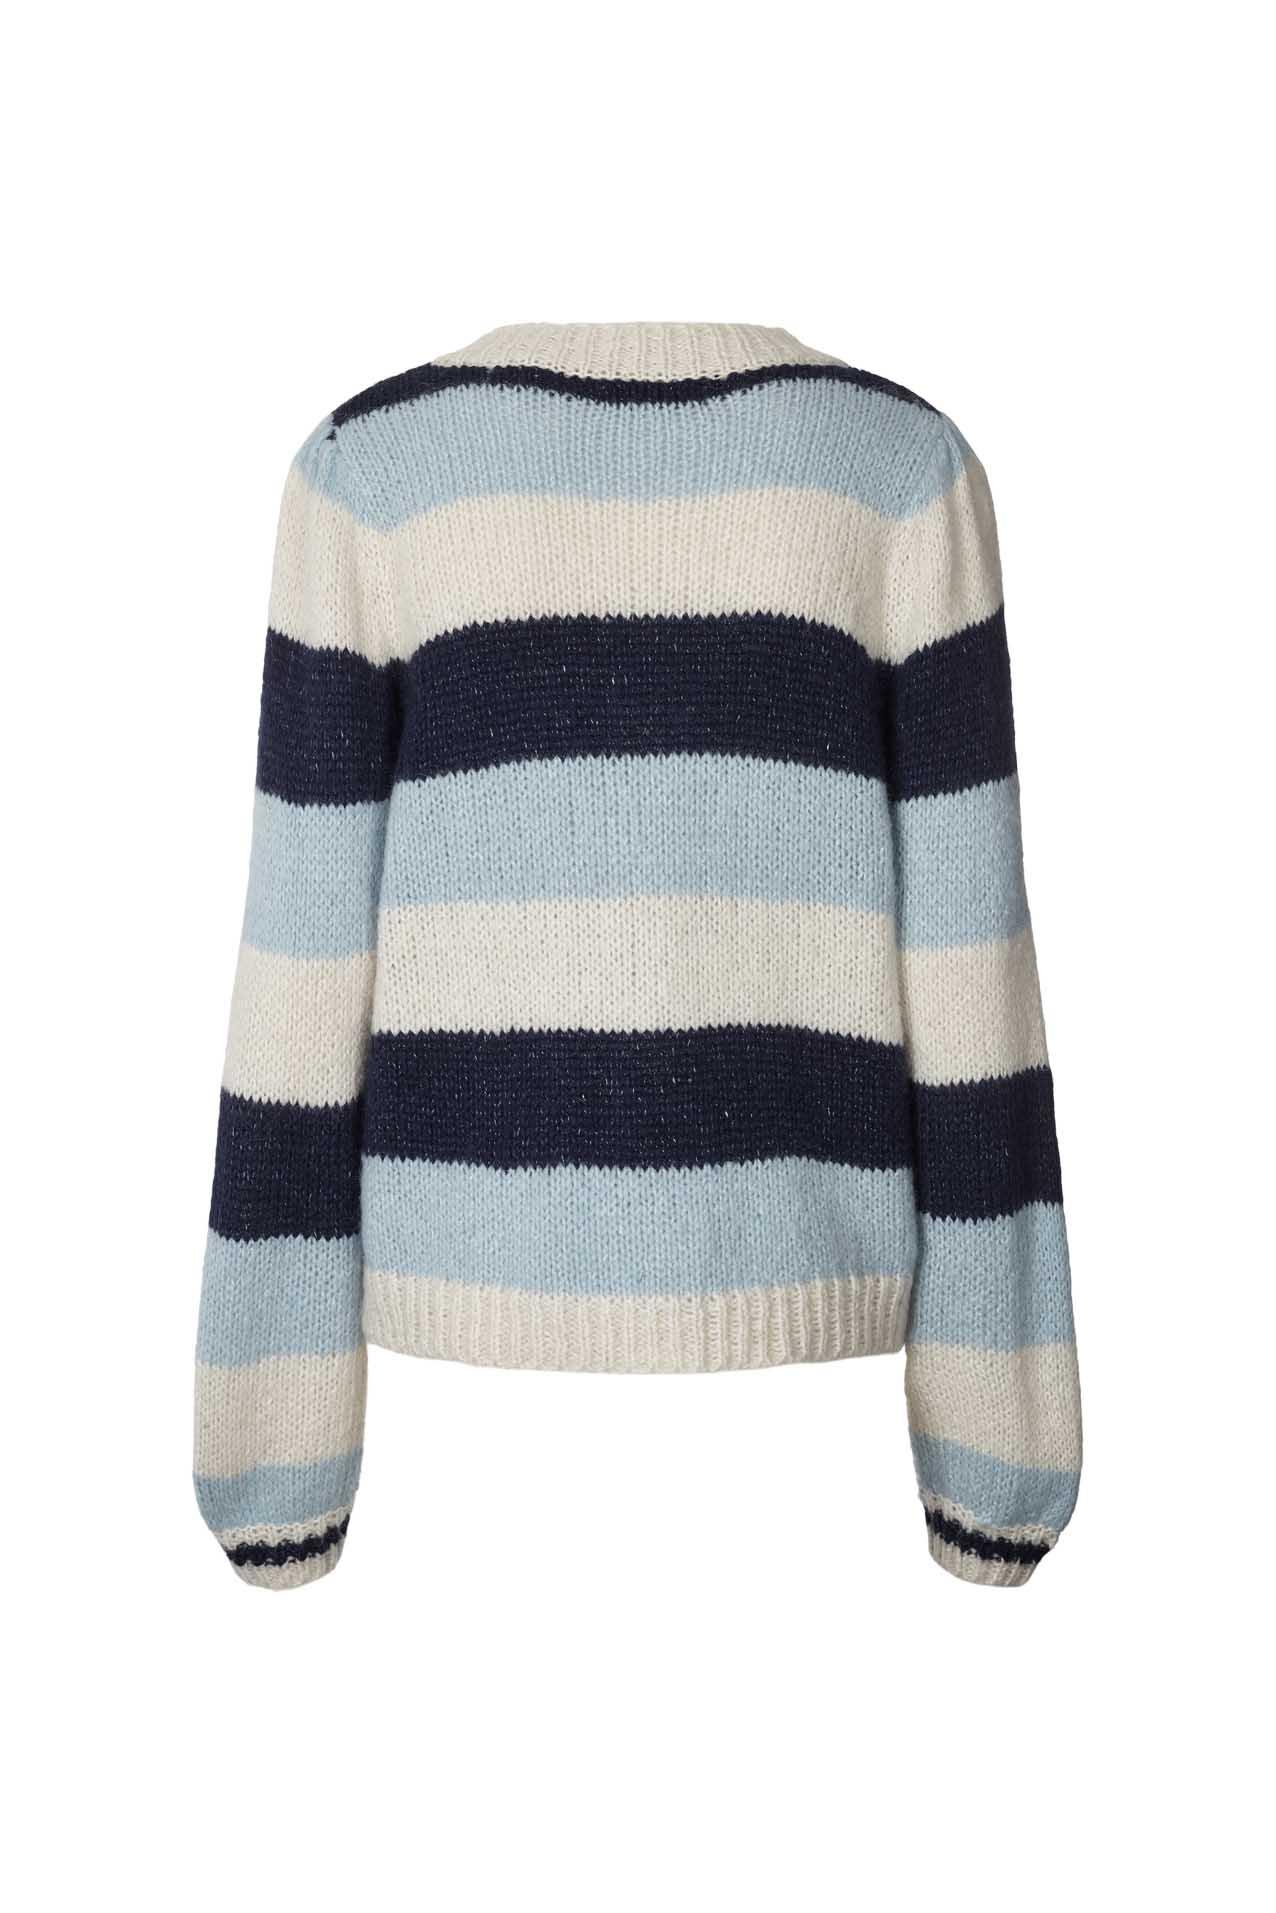 Lollys Laundry Pippa cardigan, blue, x-large